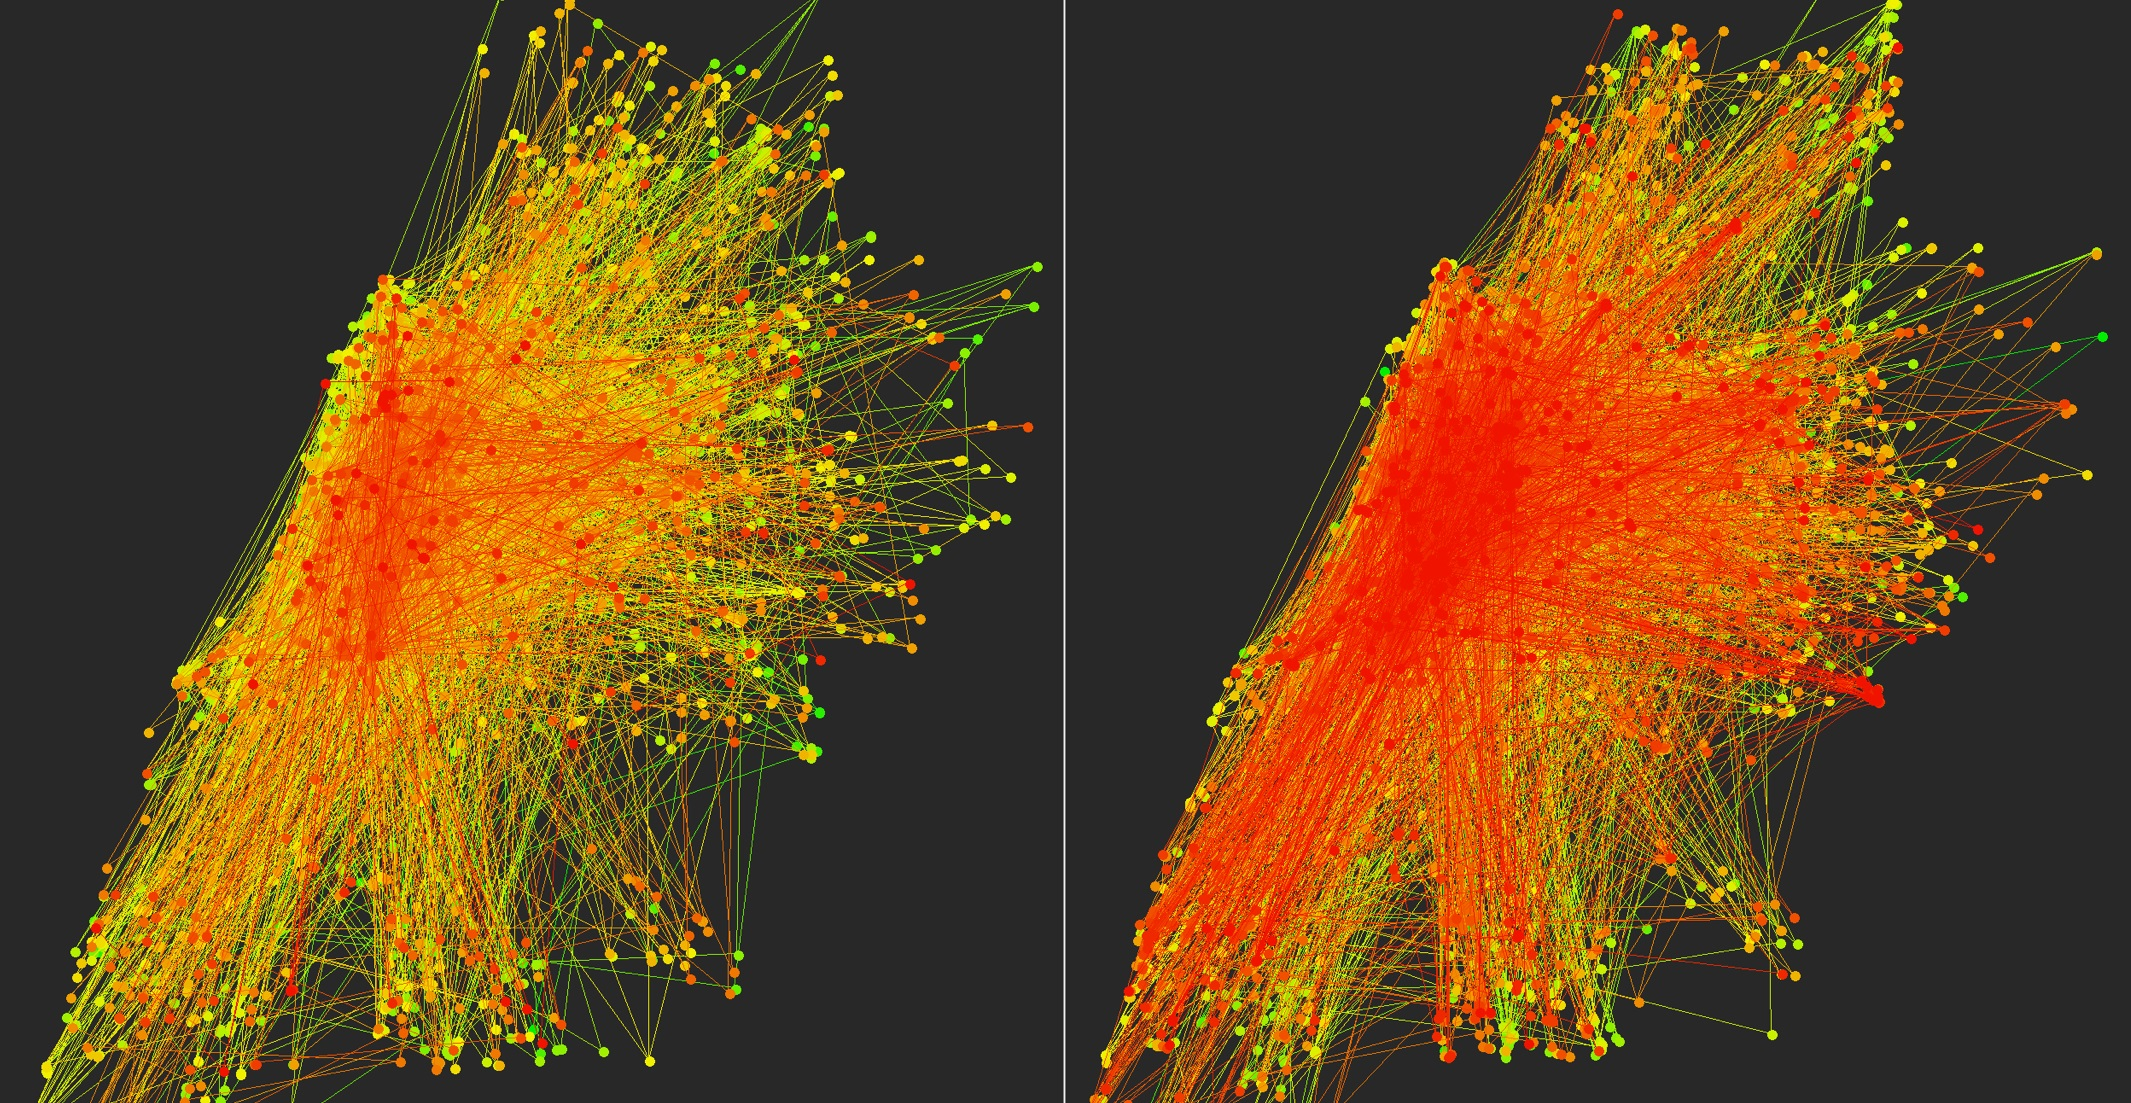 lev manovich the science of culture social computing digital